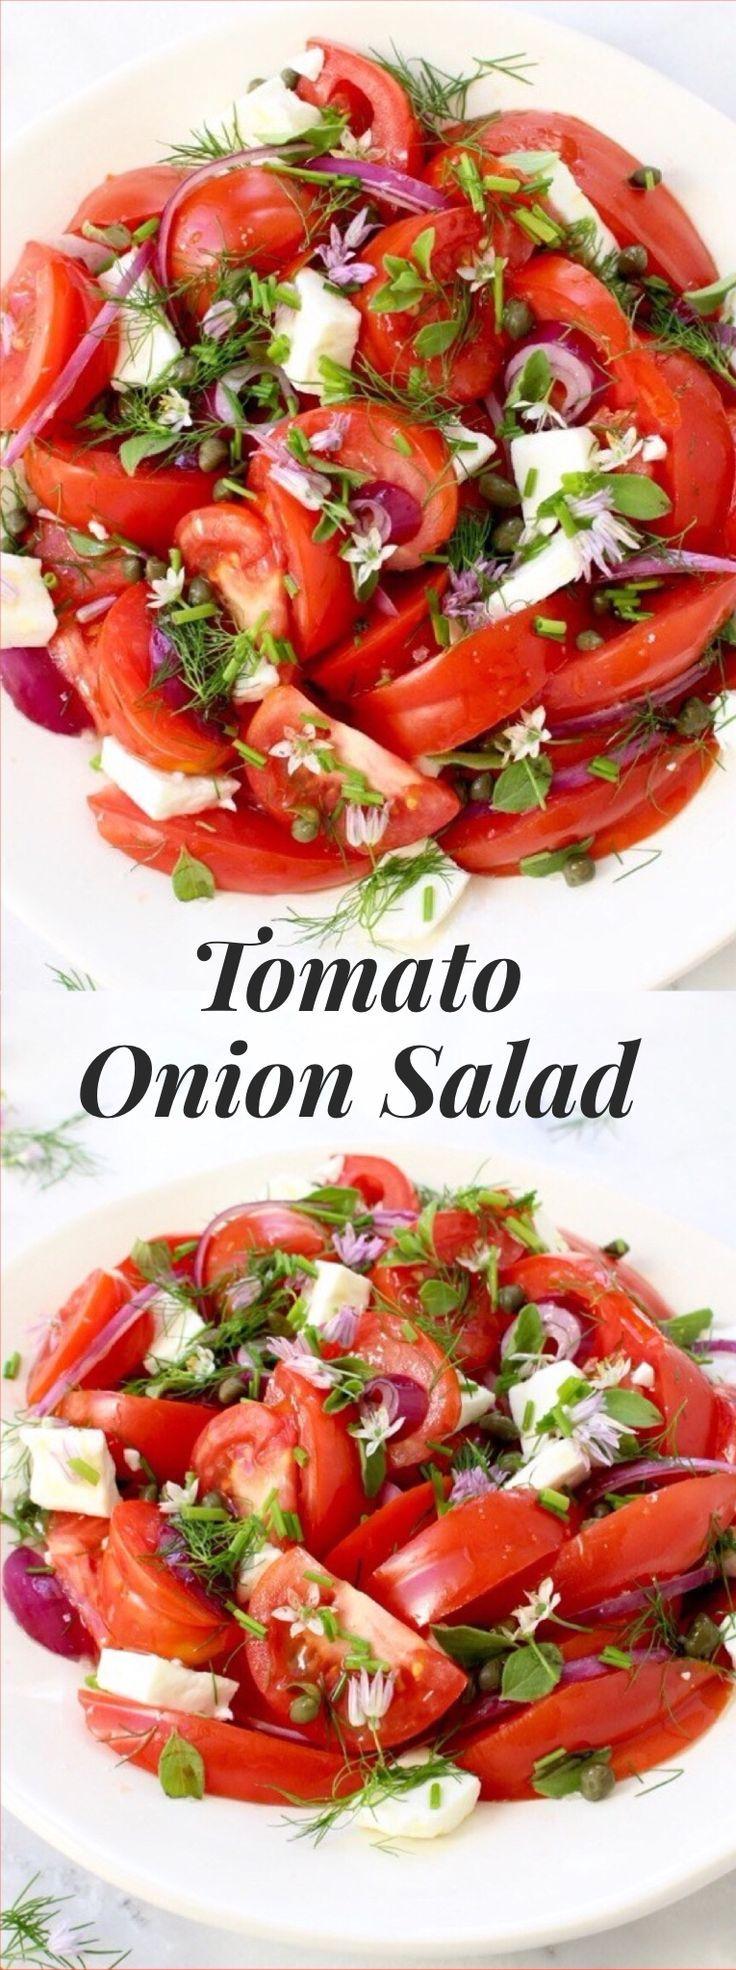 Tomato Onion Salad Recipe | http://CiaoFlorentina.com @CiaoFlorentina